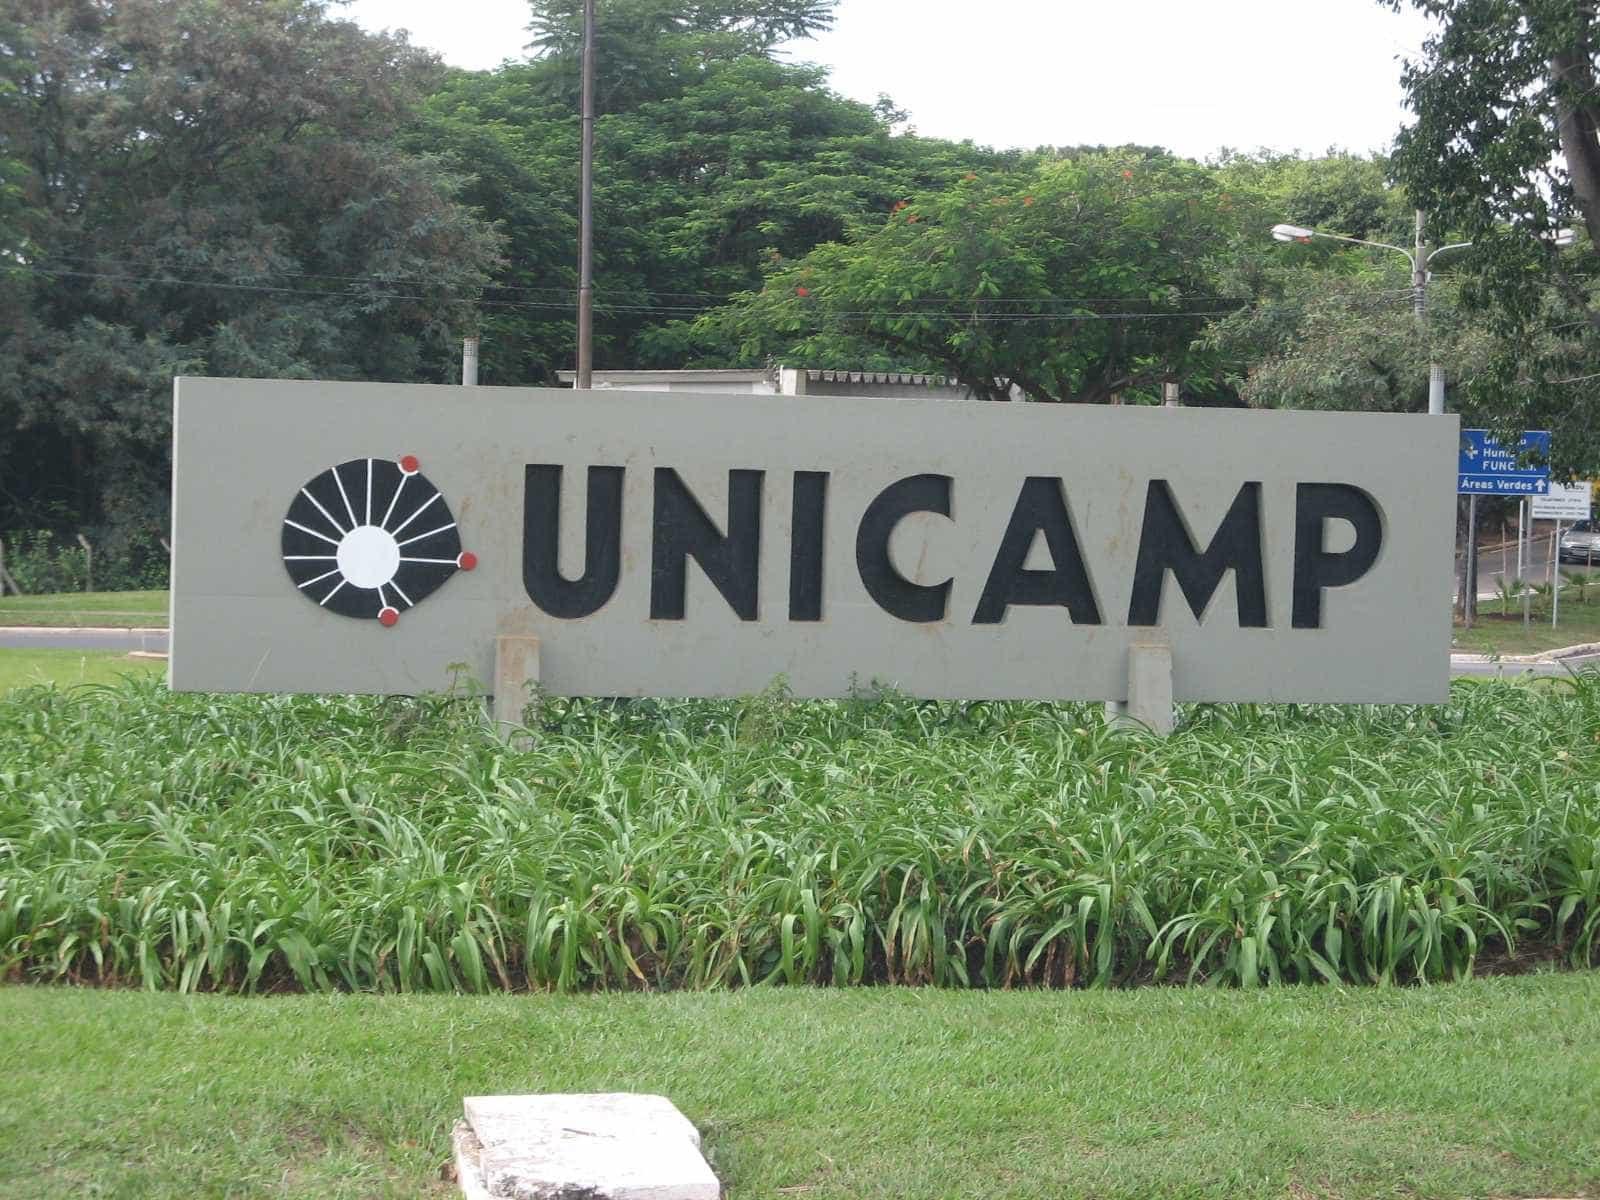 Segunda fase do vestibular da Unicamp começa hoje